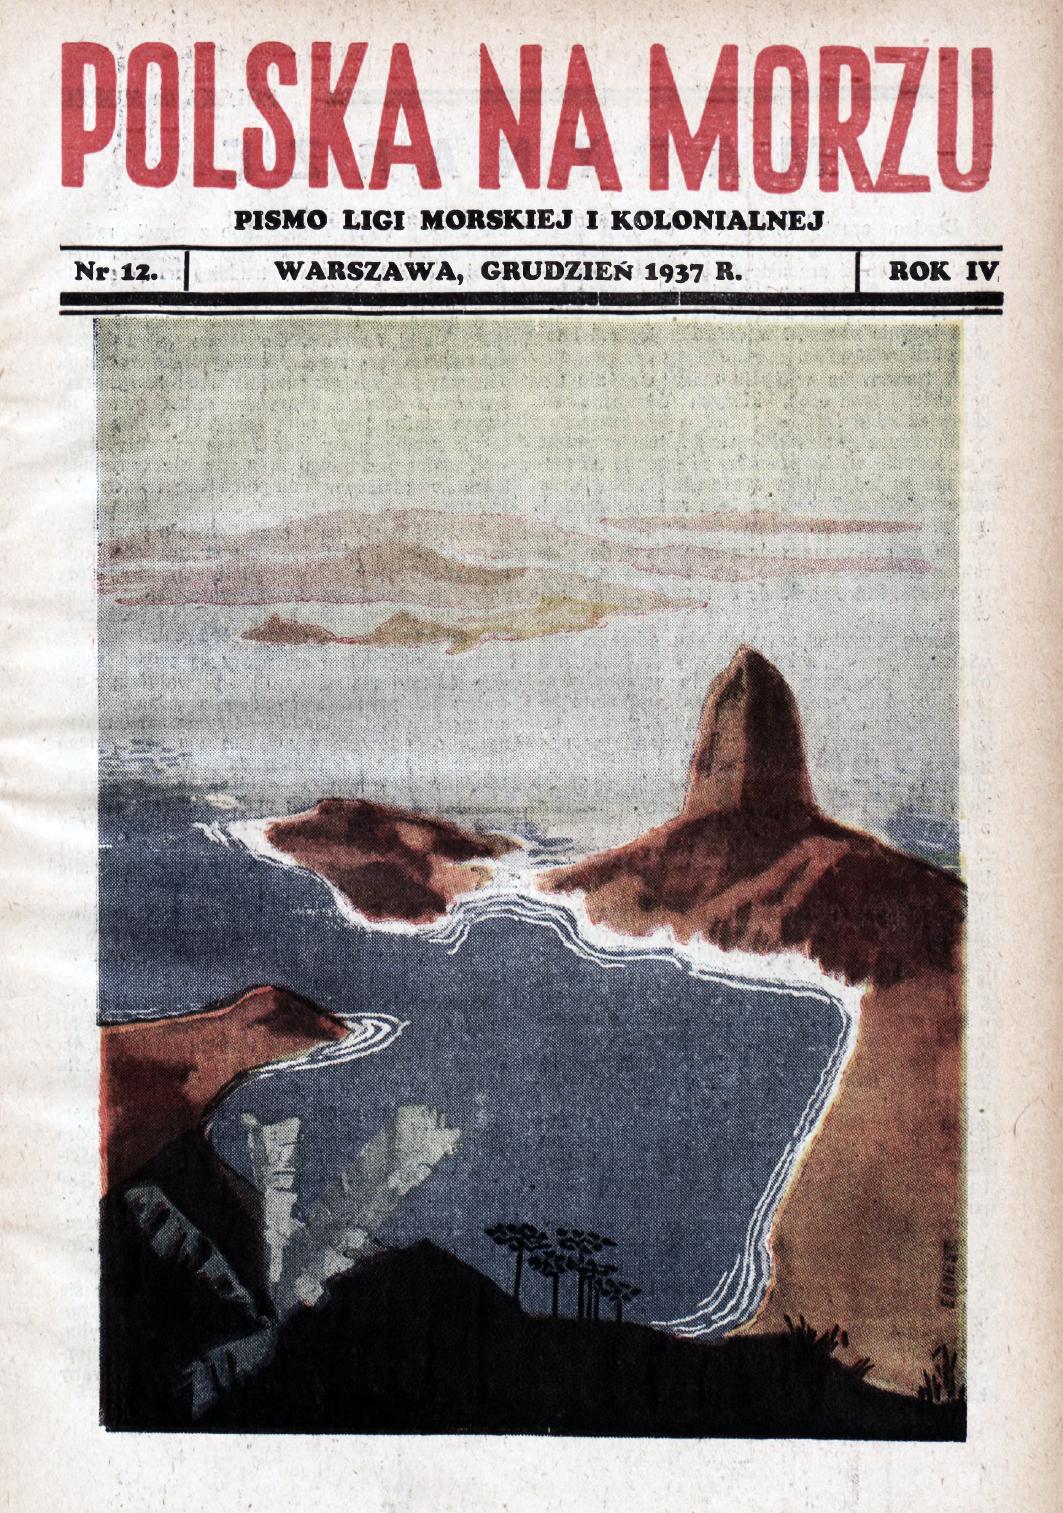 Polska na Morzu : pismo Ligi Morskiej i Kolonjalnej. - Liga Morska i Kolonjalna, 1937, nr 12